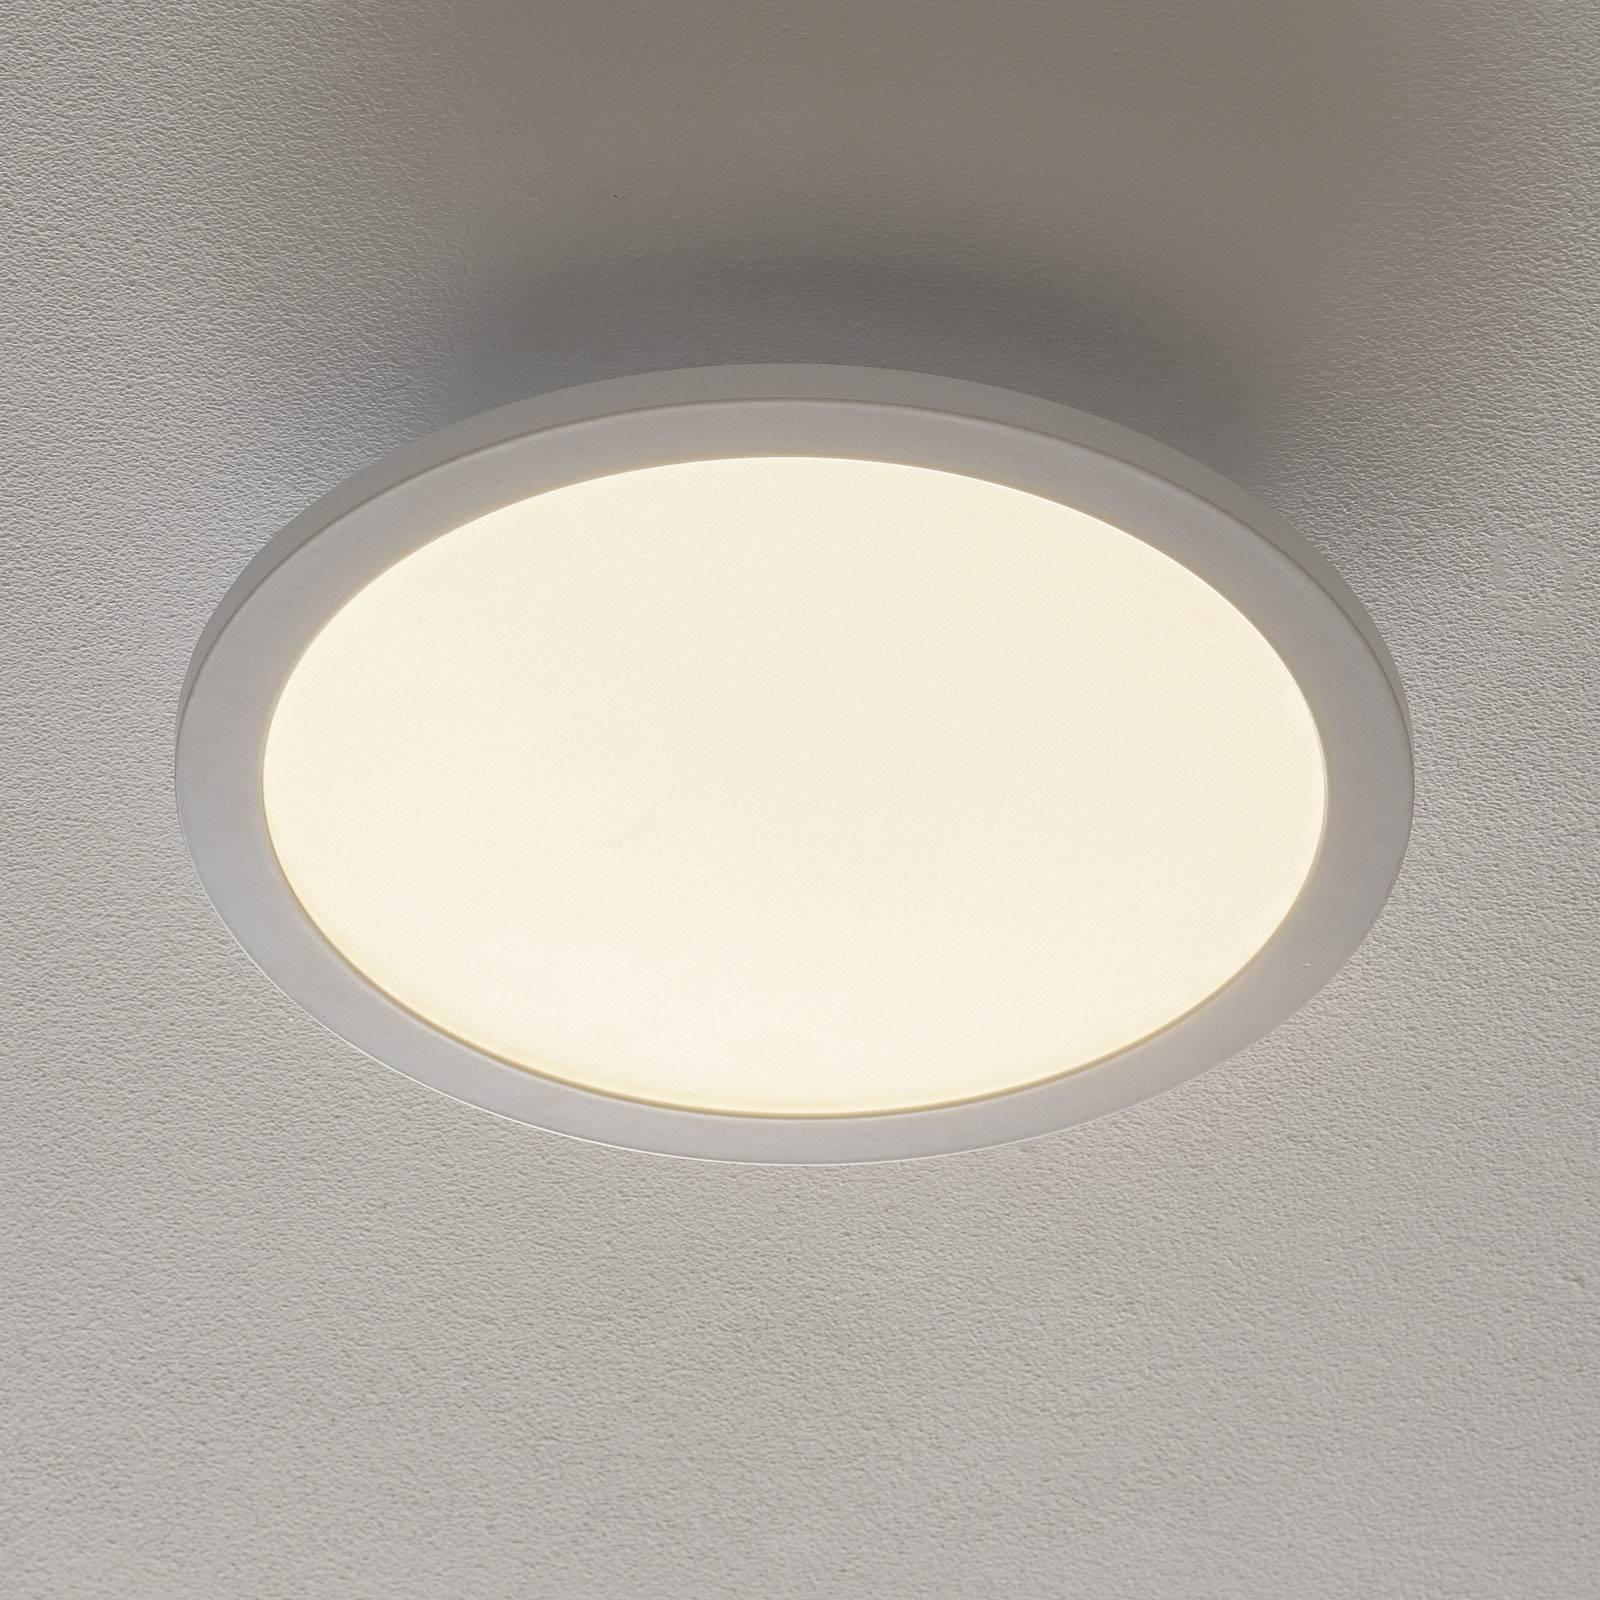 EGLO connect Sarsina-C -LED-kattovalaisin, 30 cm